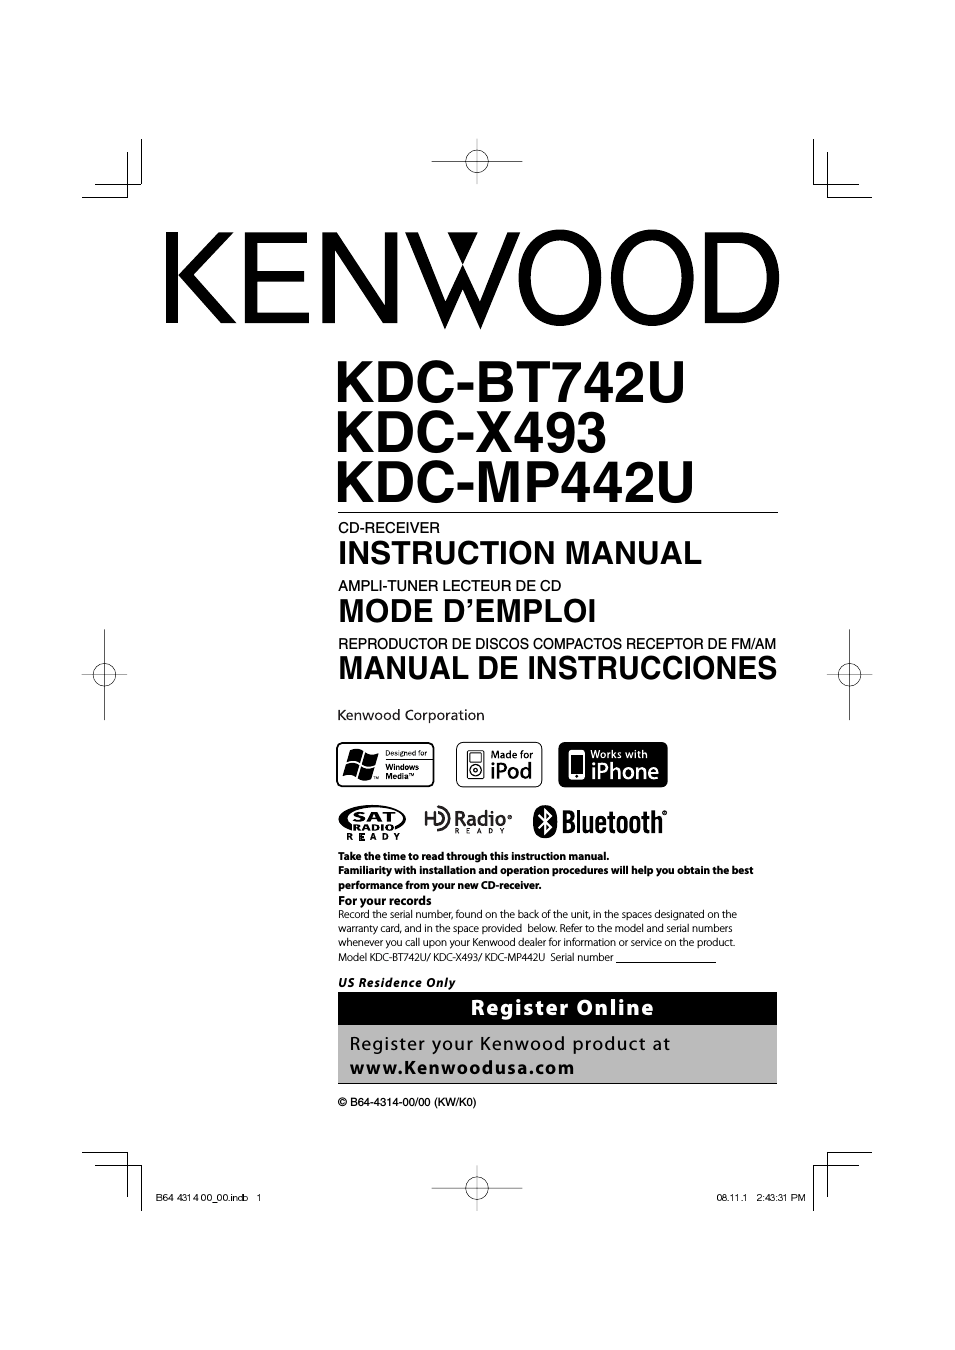 [SCHEMATICS_4ER]  YZ_4971] Out Diagram For A Kenwood Cd Receiver Kdc128 Audio Car Cd Changer Wiring  Diagram | Kenwood Kdc Bt742u Wiring Diagram |  | Gue45 Umng Mohammedshrine Librar Wiring 101